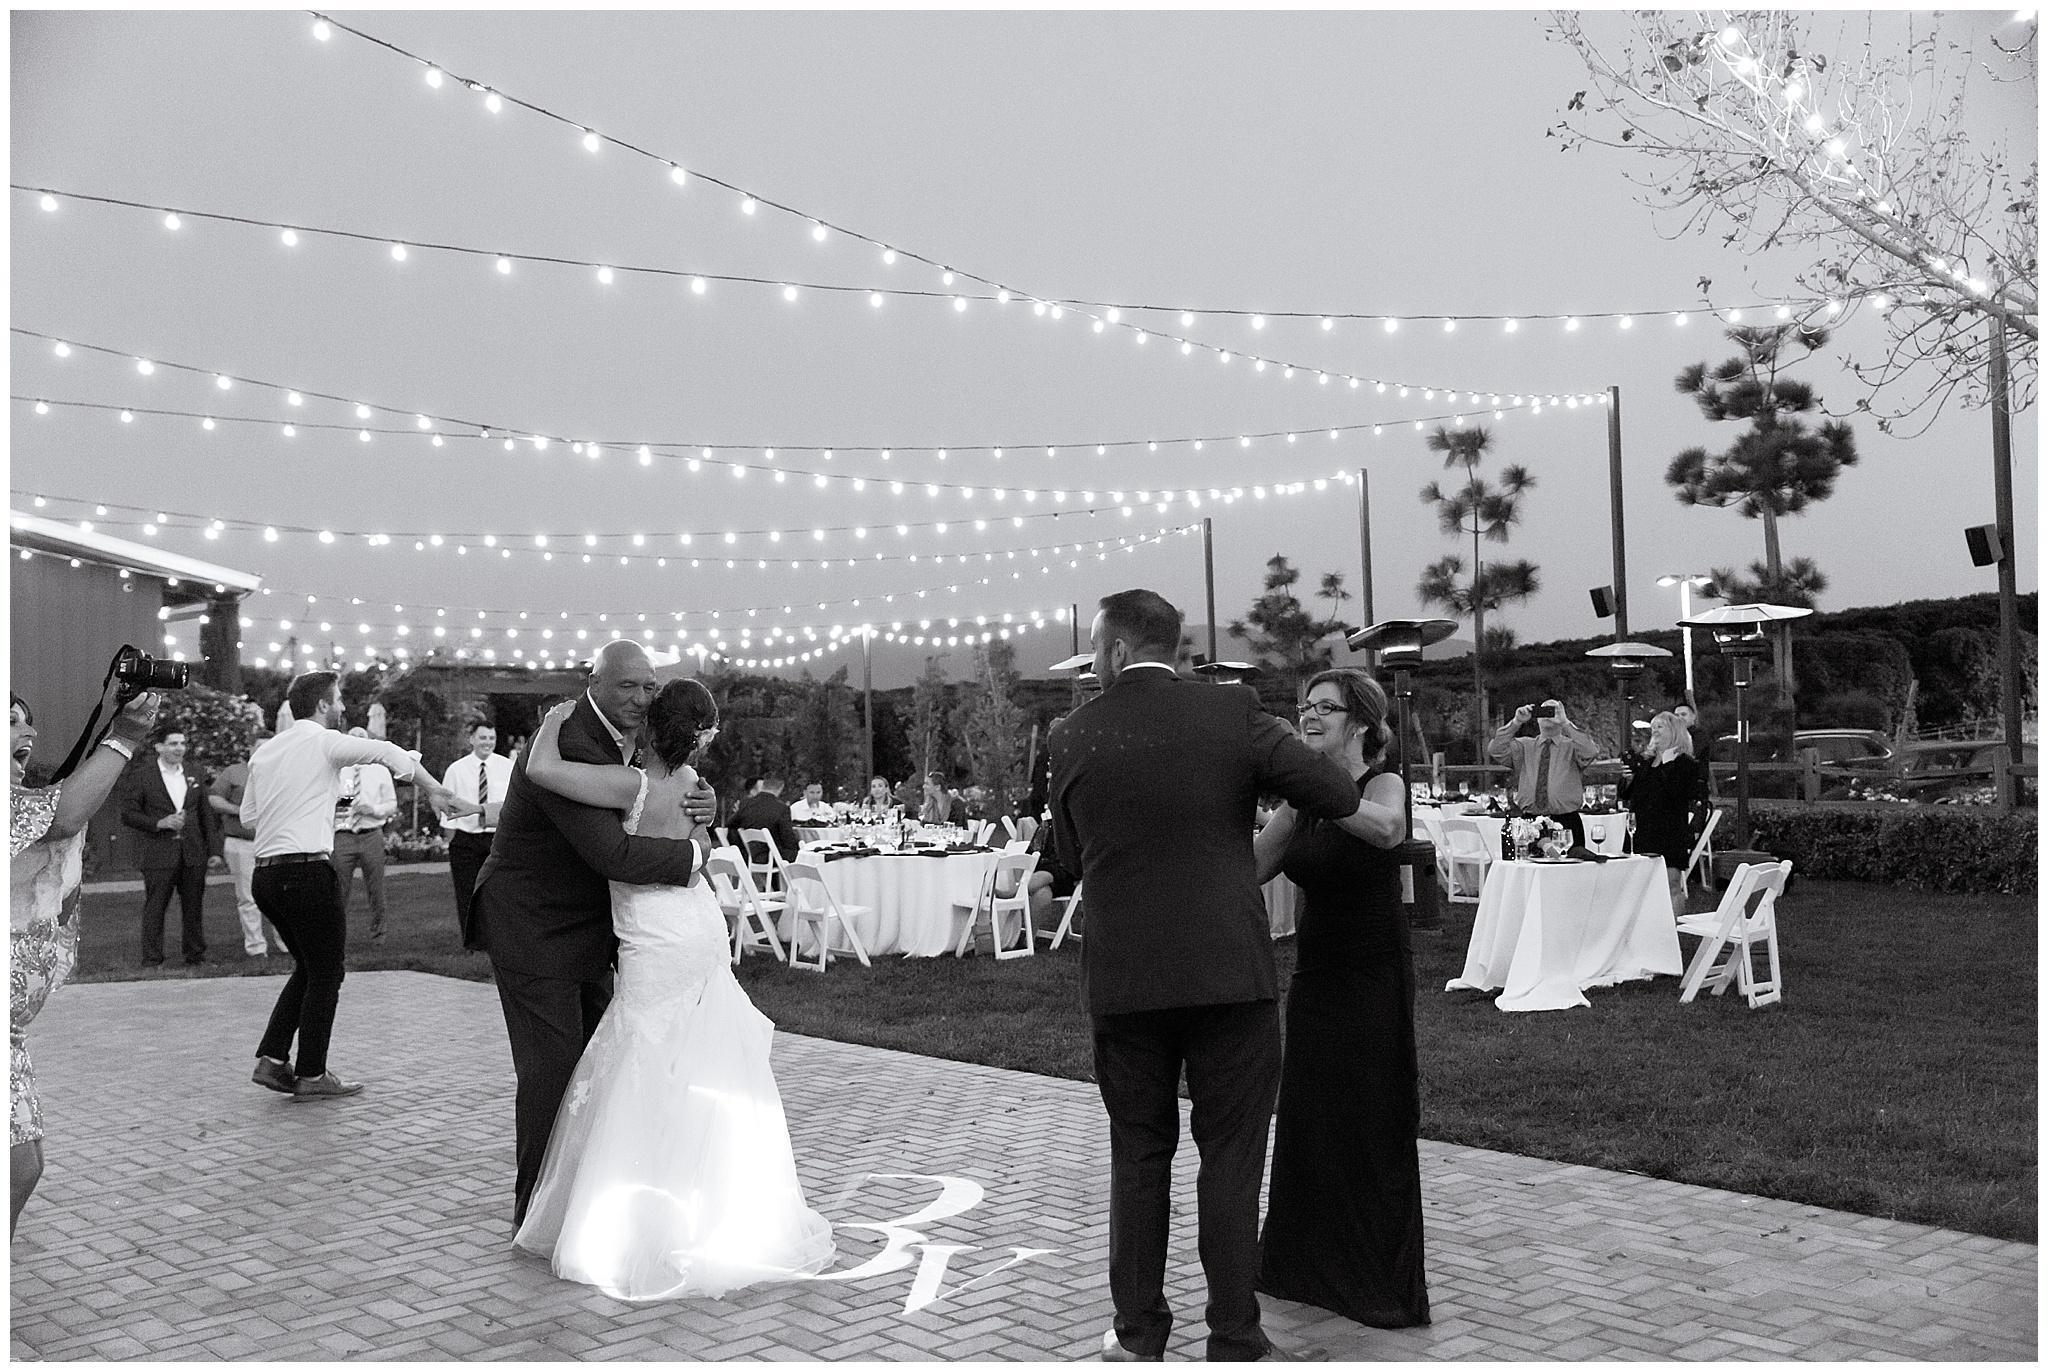 Vinny-Cayt-Wedding-04-26-18-2064-2.jpg